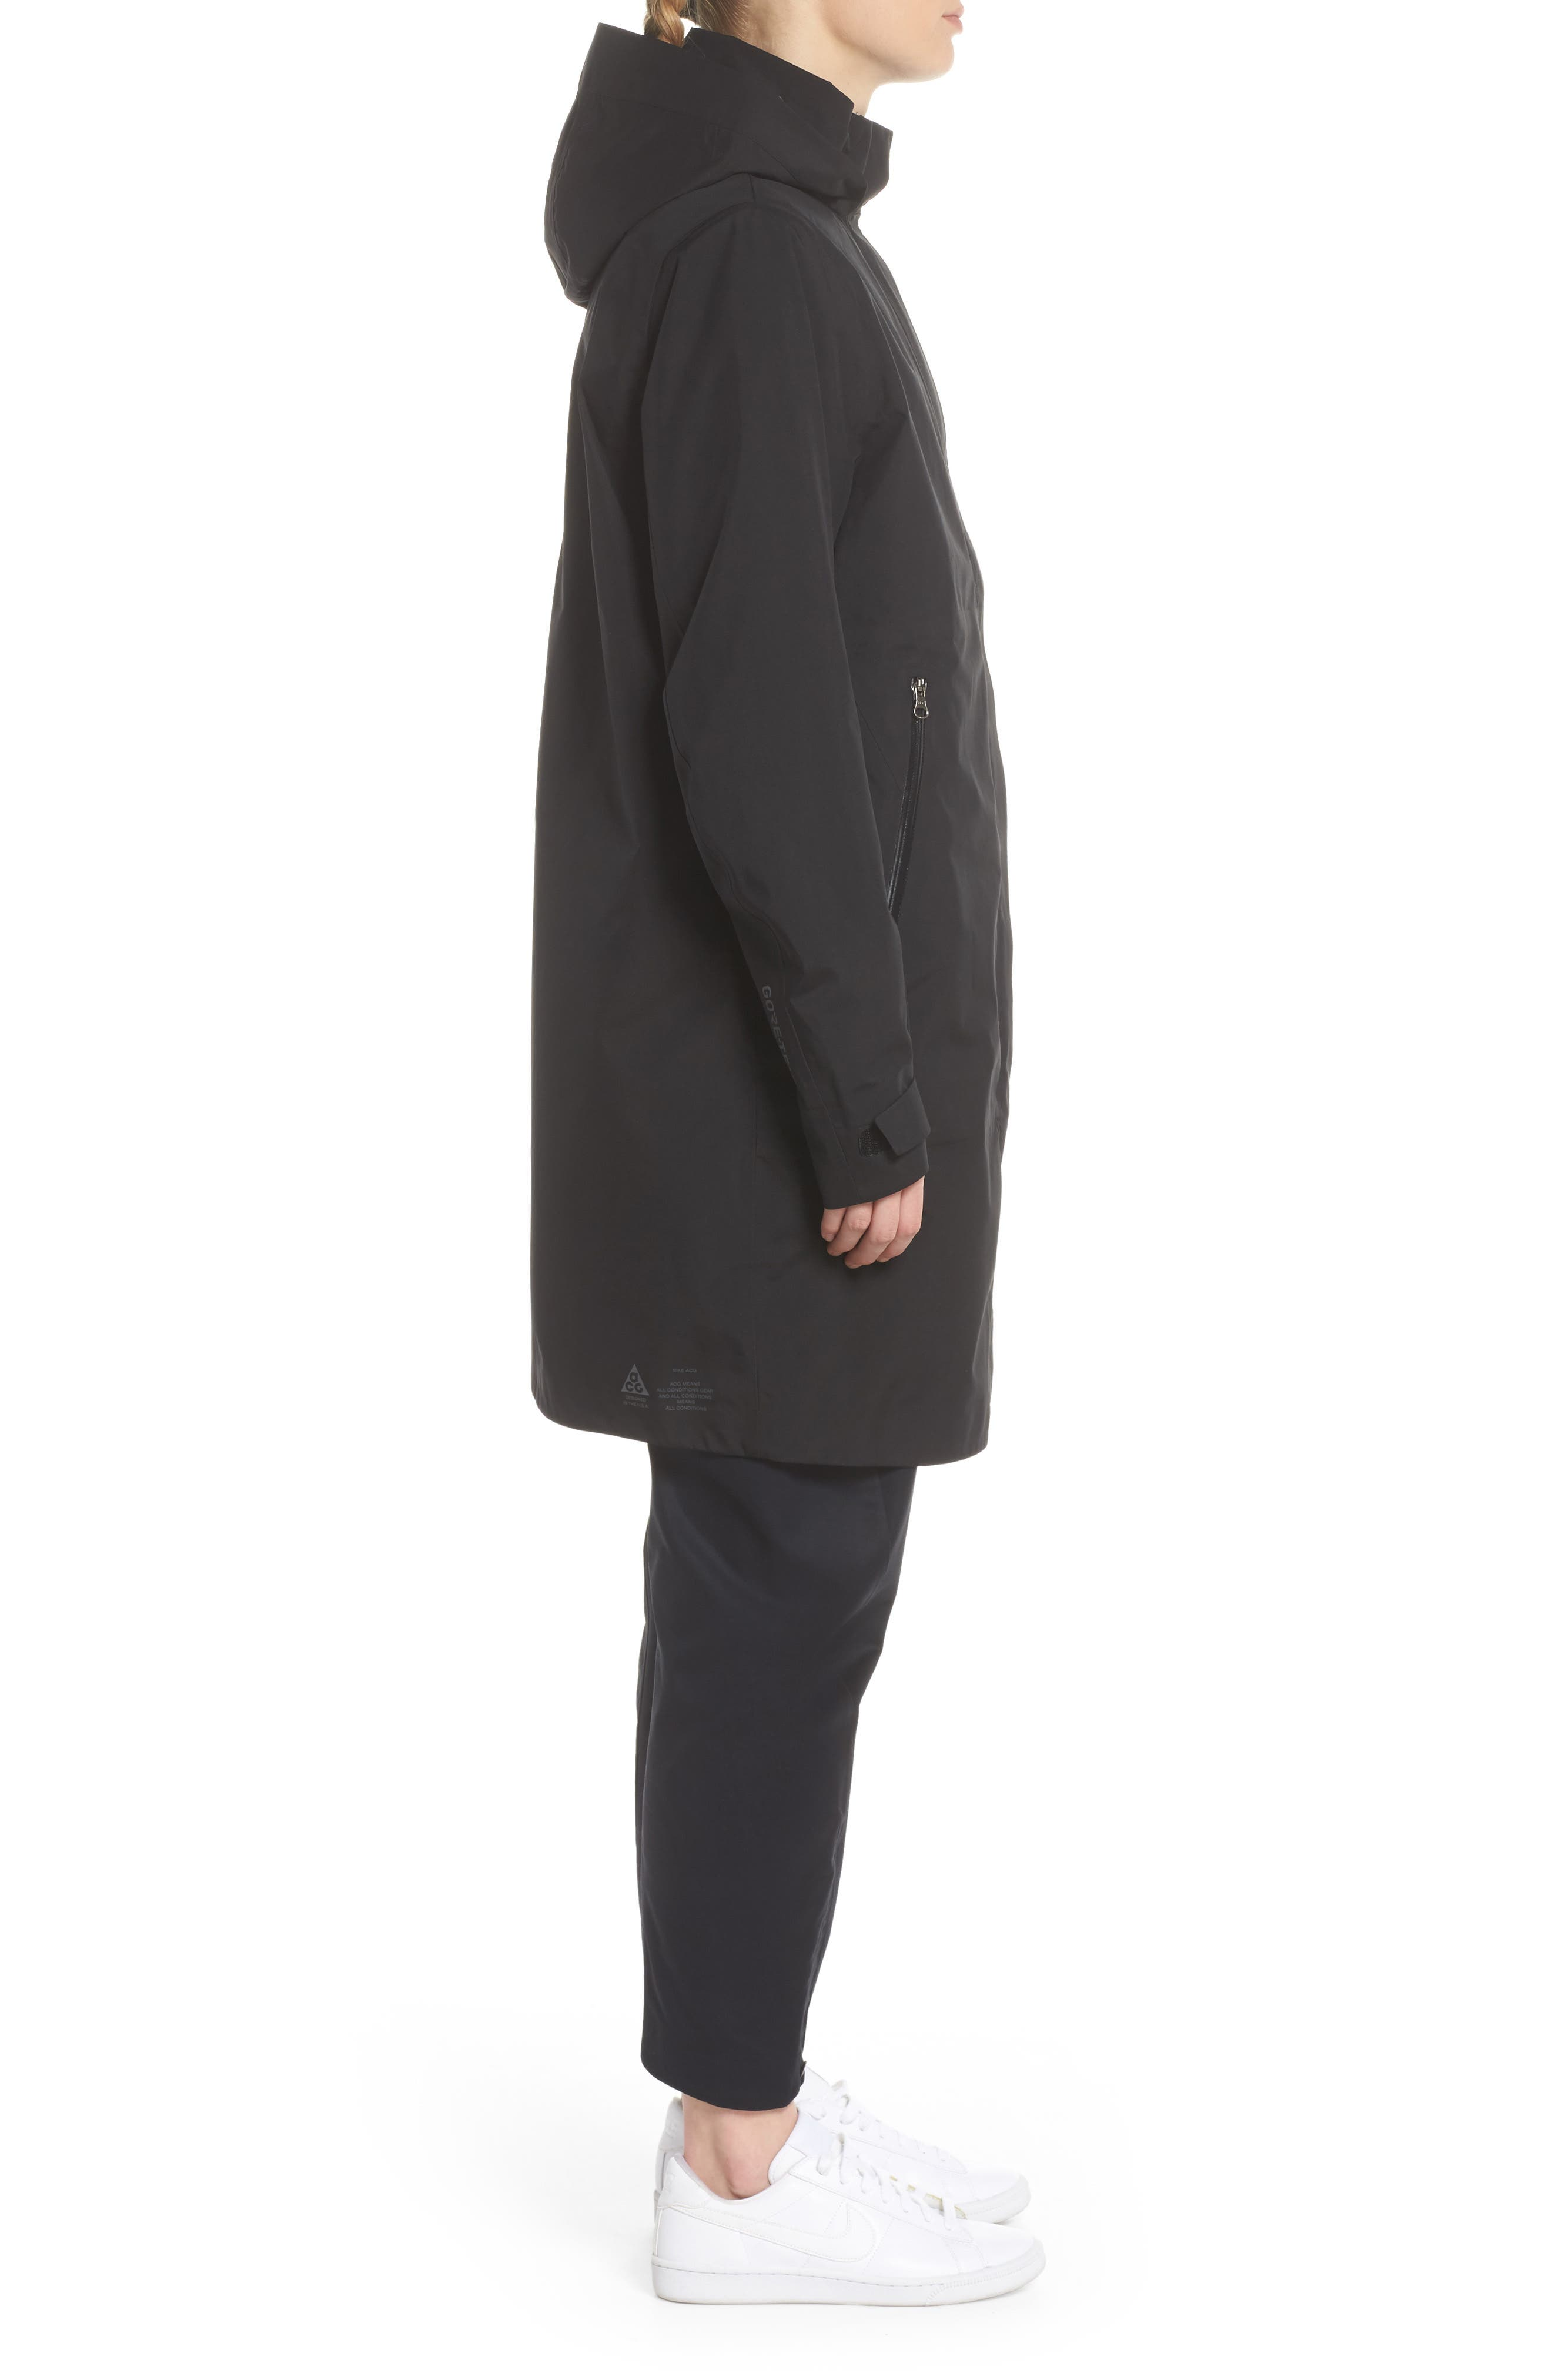 NikeLab ACG 3-in-1 System Women's Coat,                             Alternate thumbnail 4, color,                             010